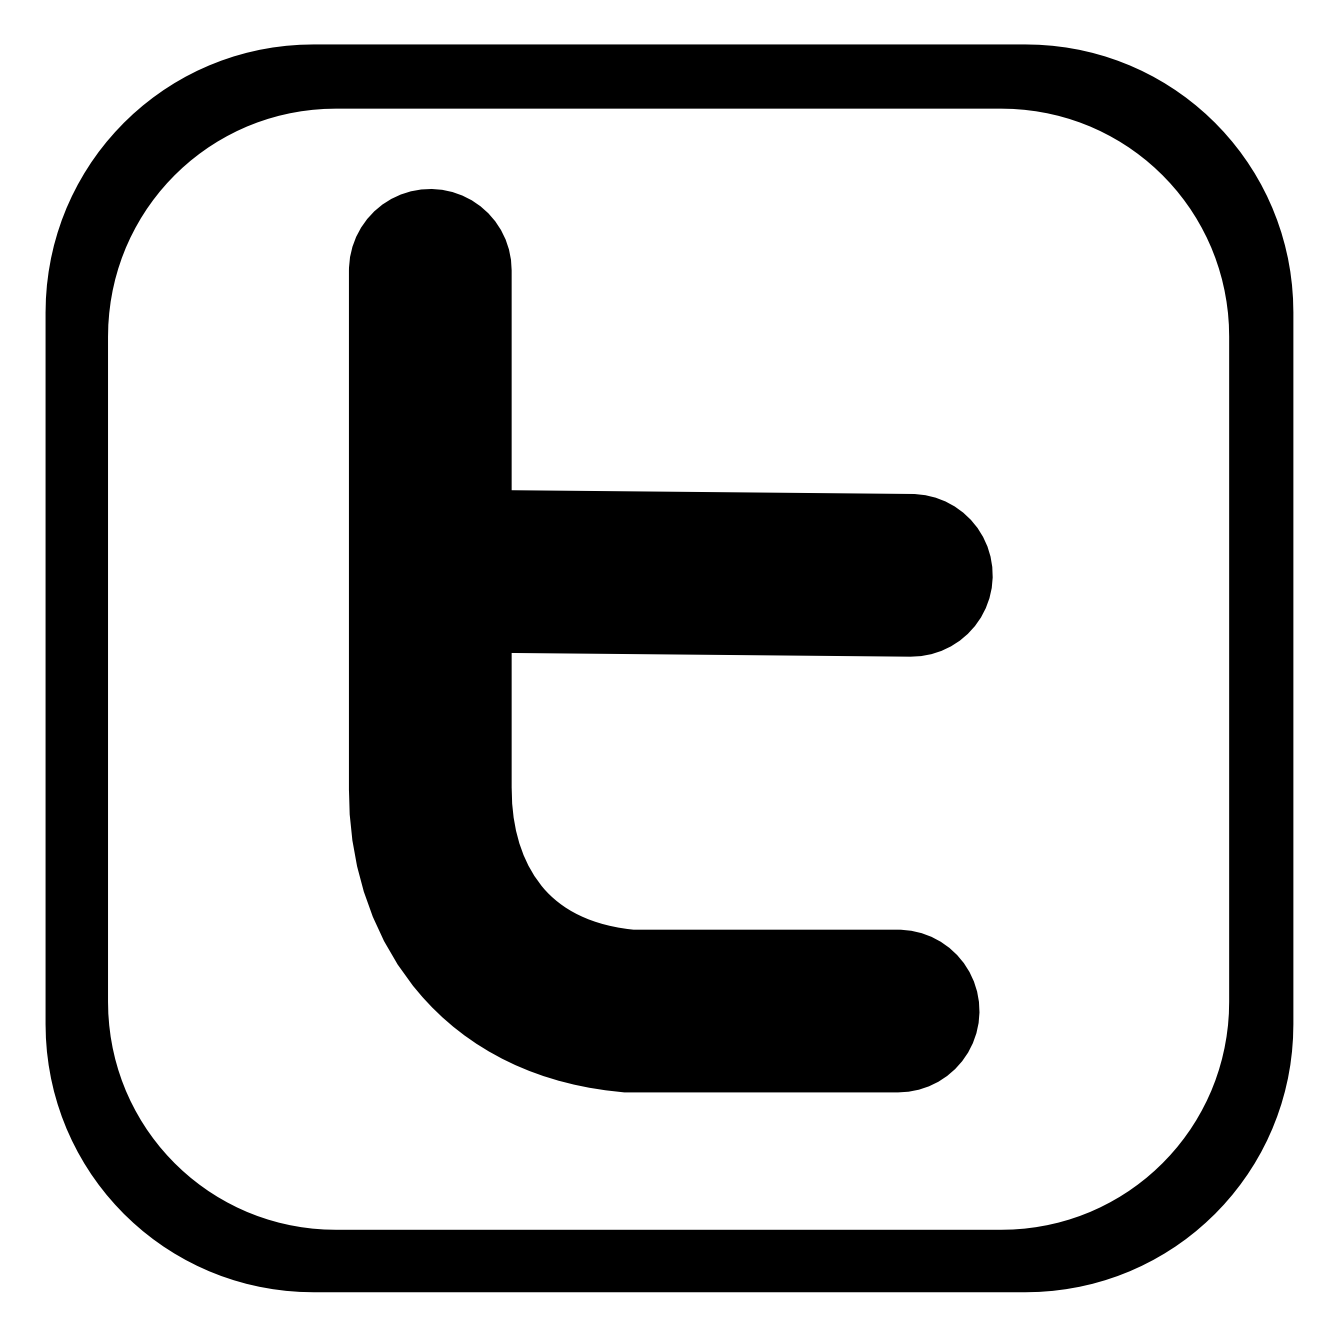 1331x1331 Twitter Logo